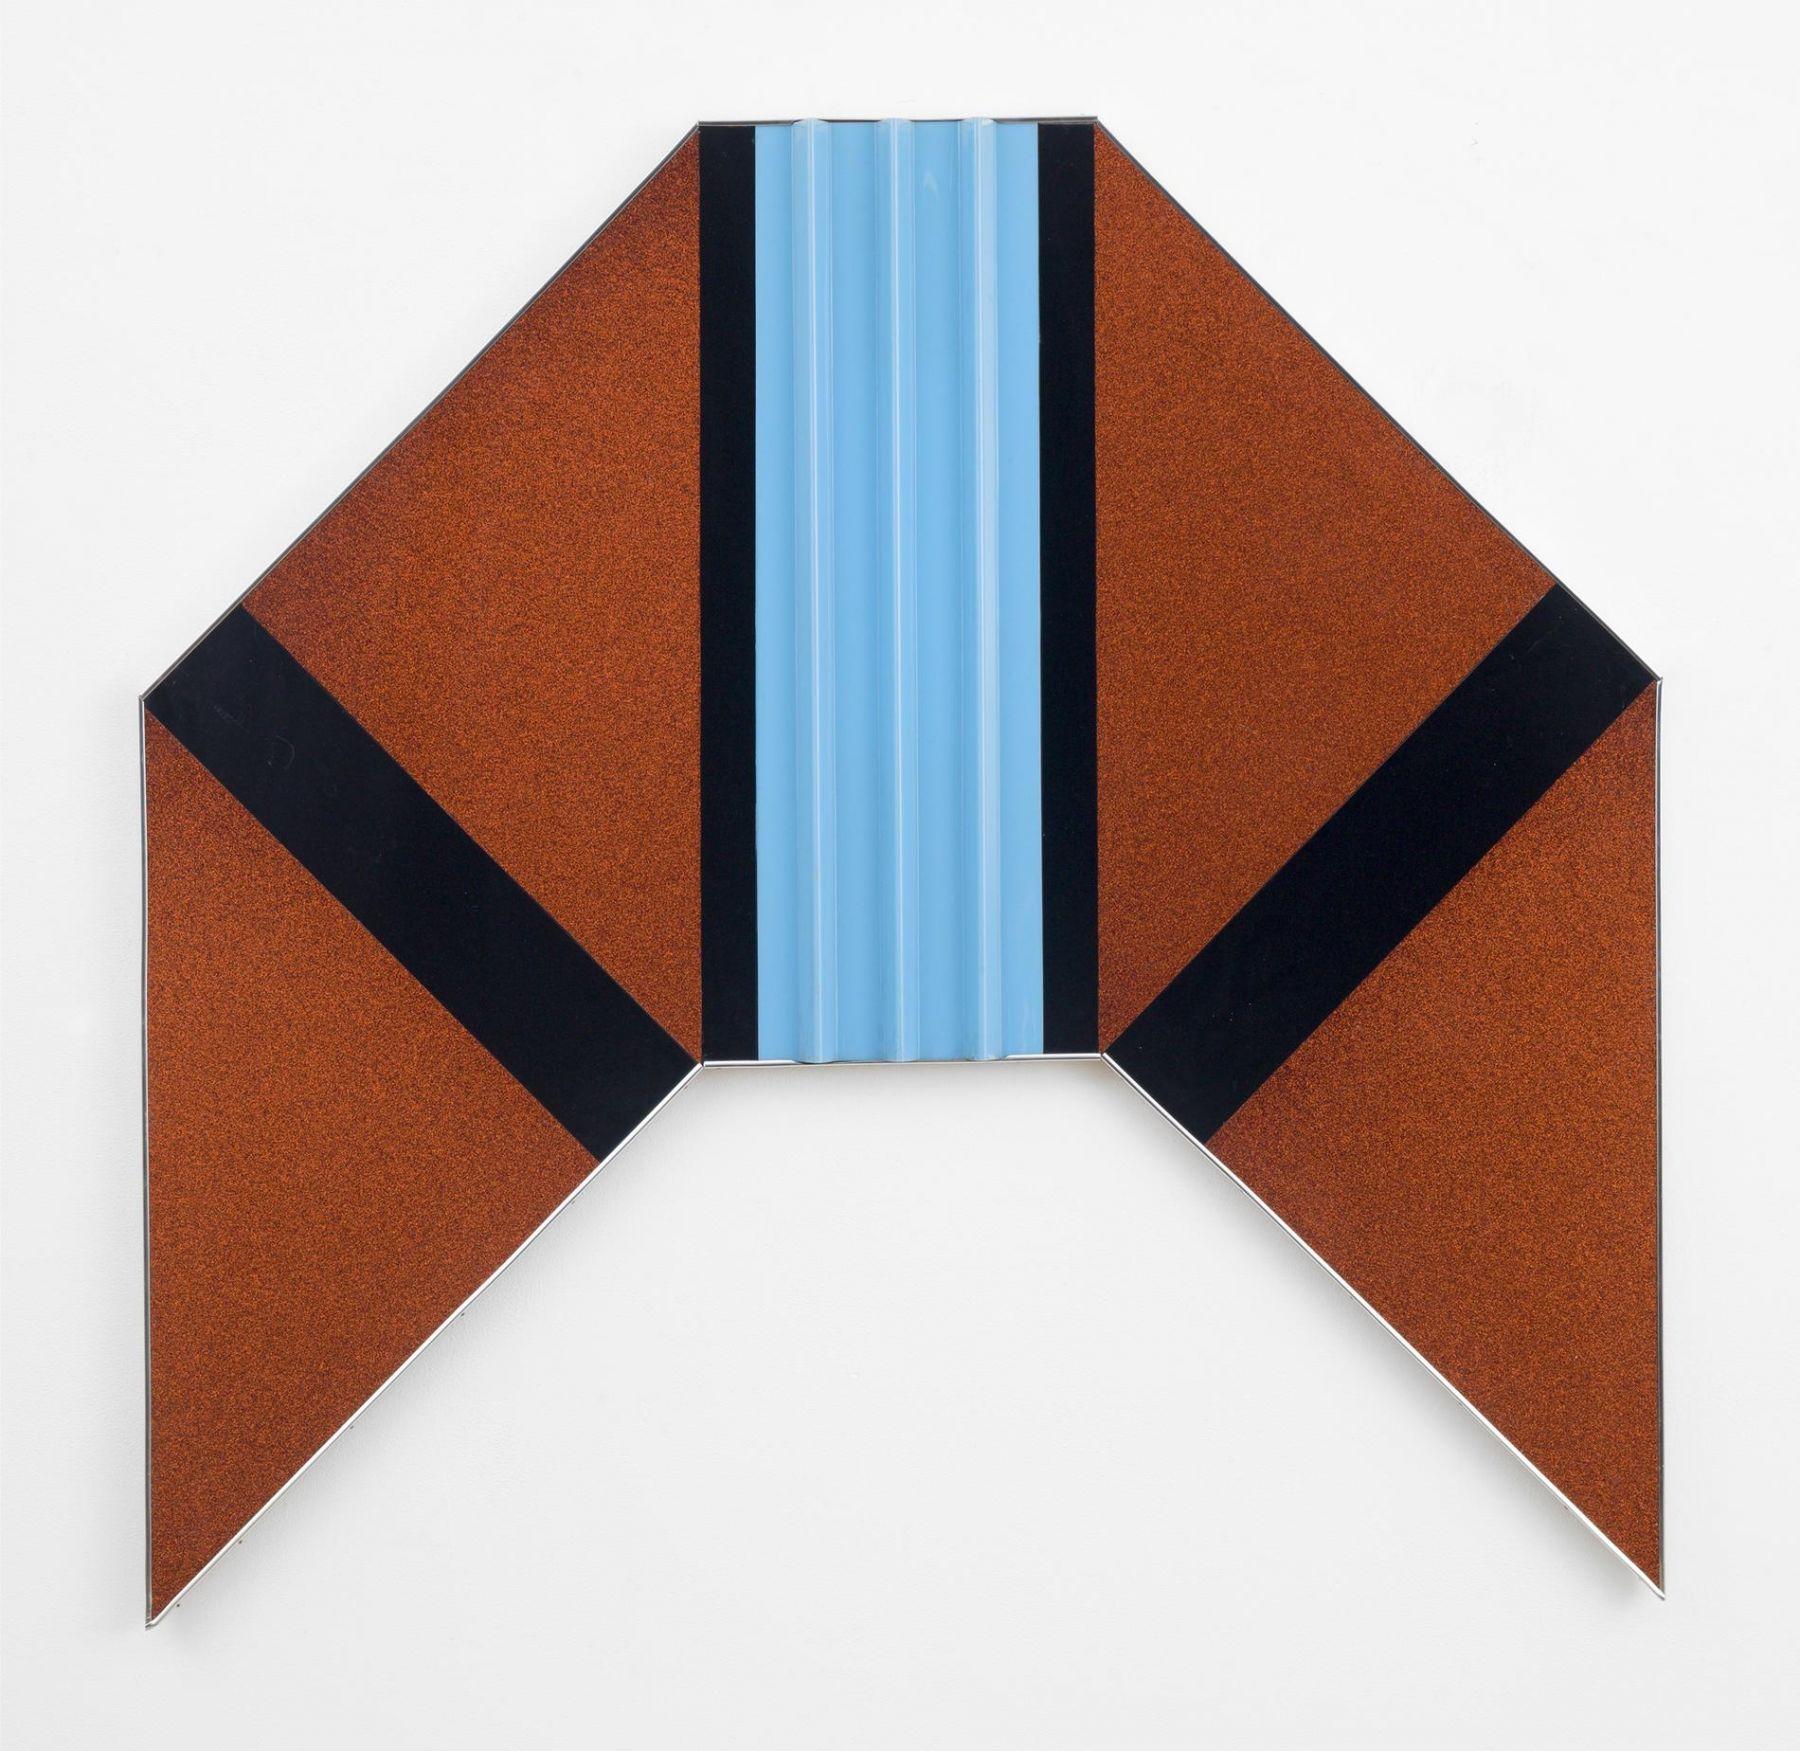 , ROBERT SMITHSON,Quick Millions, 1965,Red, glitter, light blue, black plastic panels, 54 x 56 in.